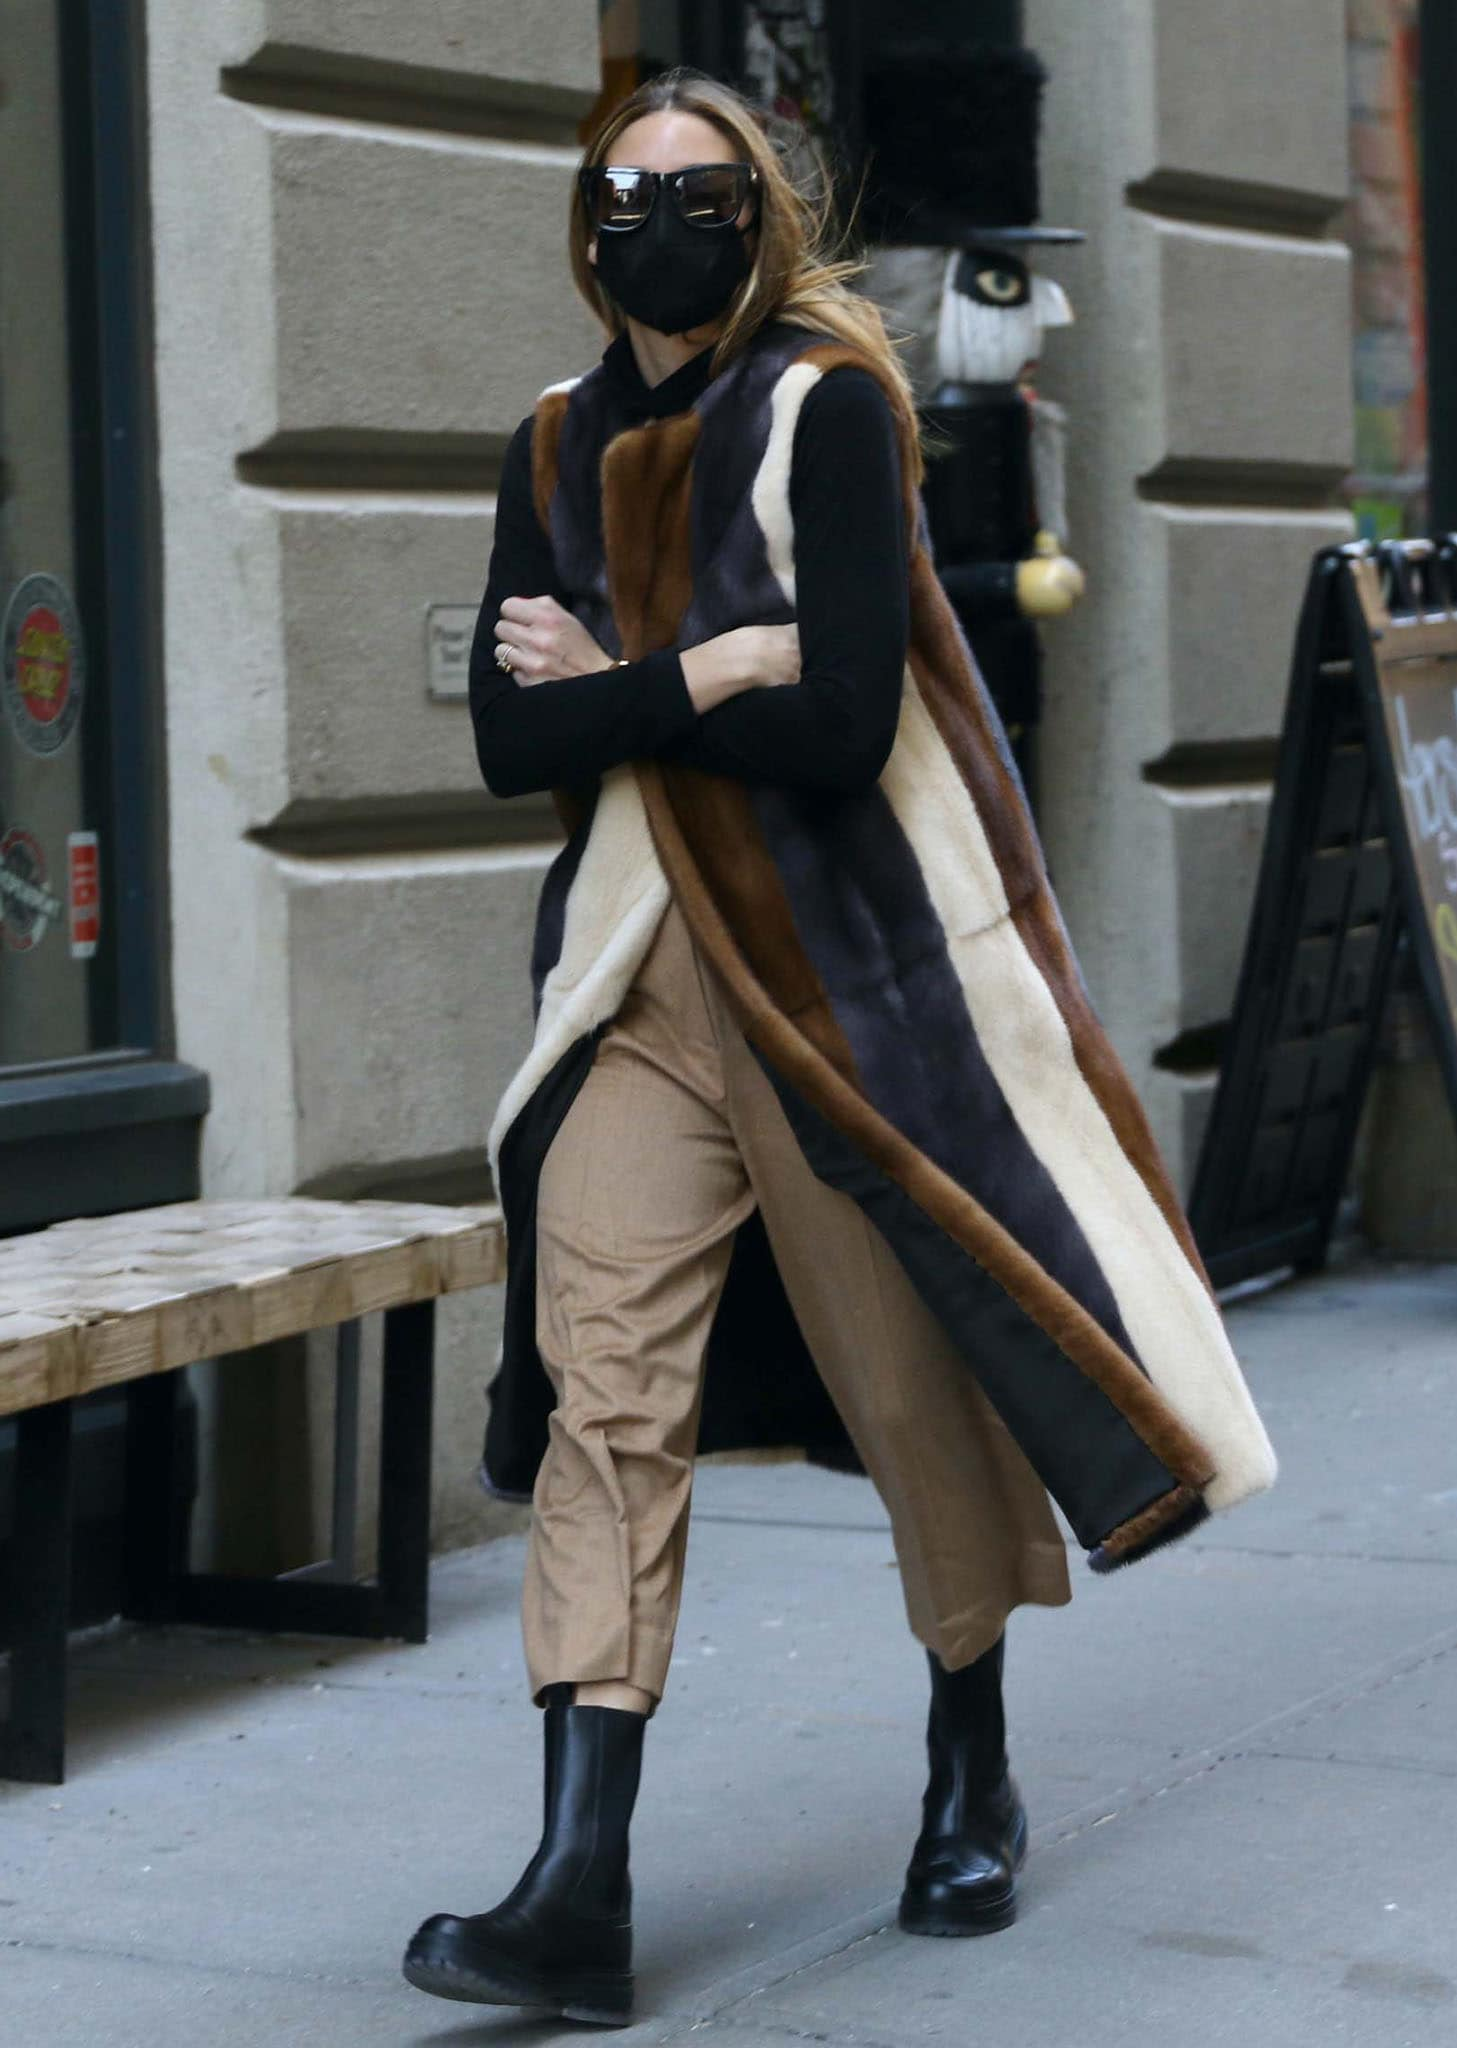 Olivia Palermo walking around her DUMBO neighborhood in Brooklyn, New York on March 3, 2021